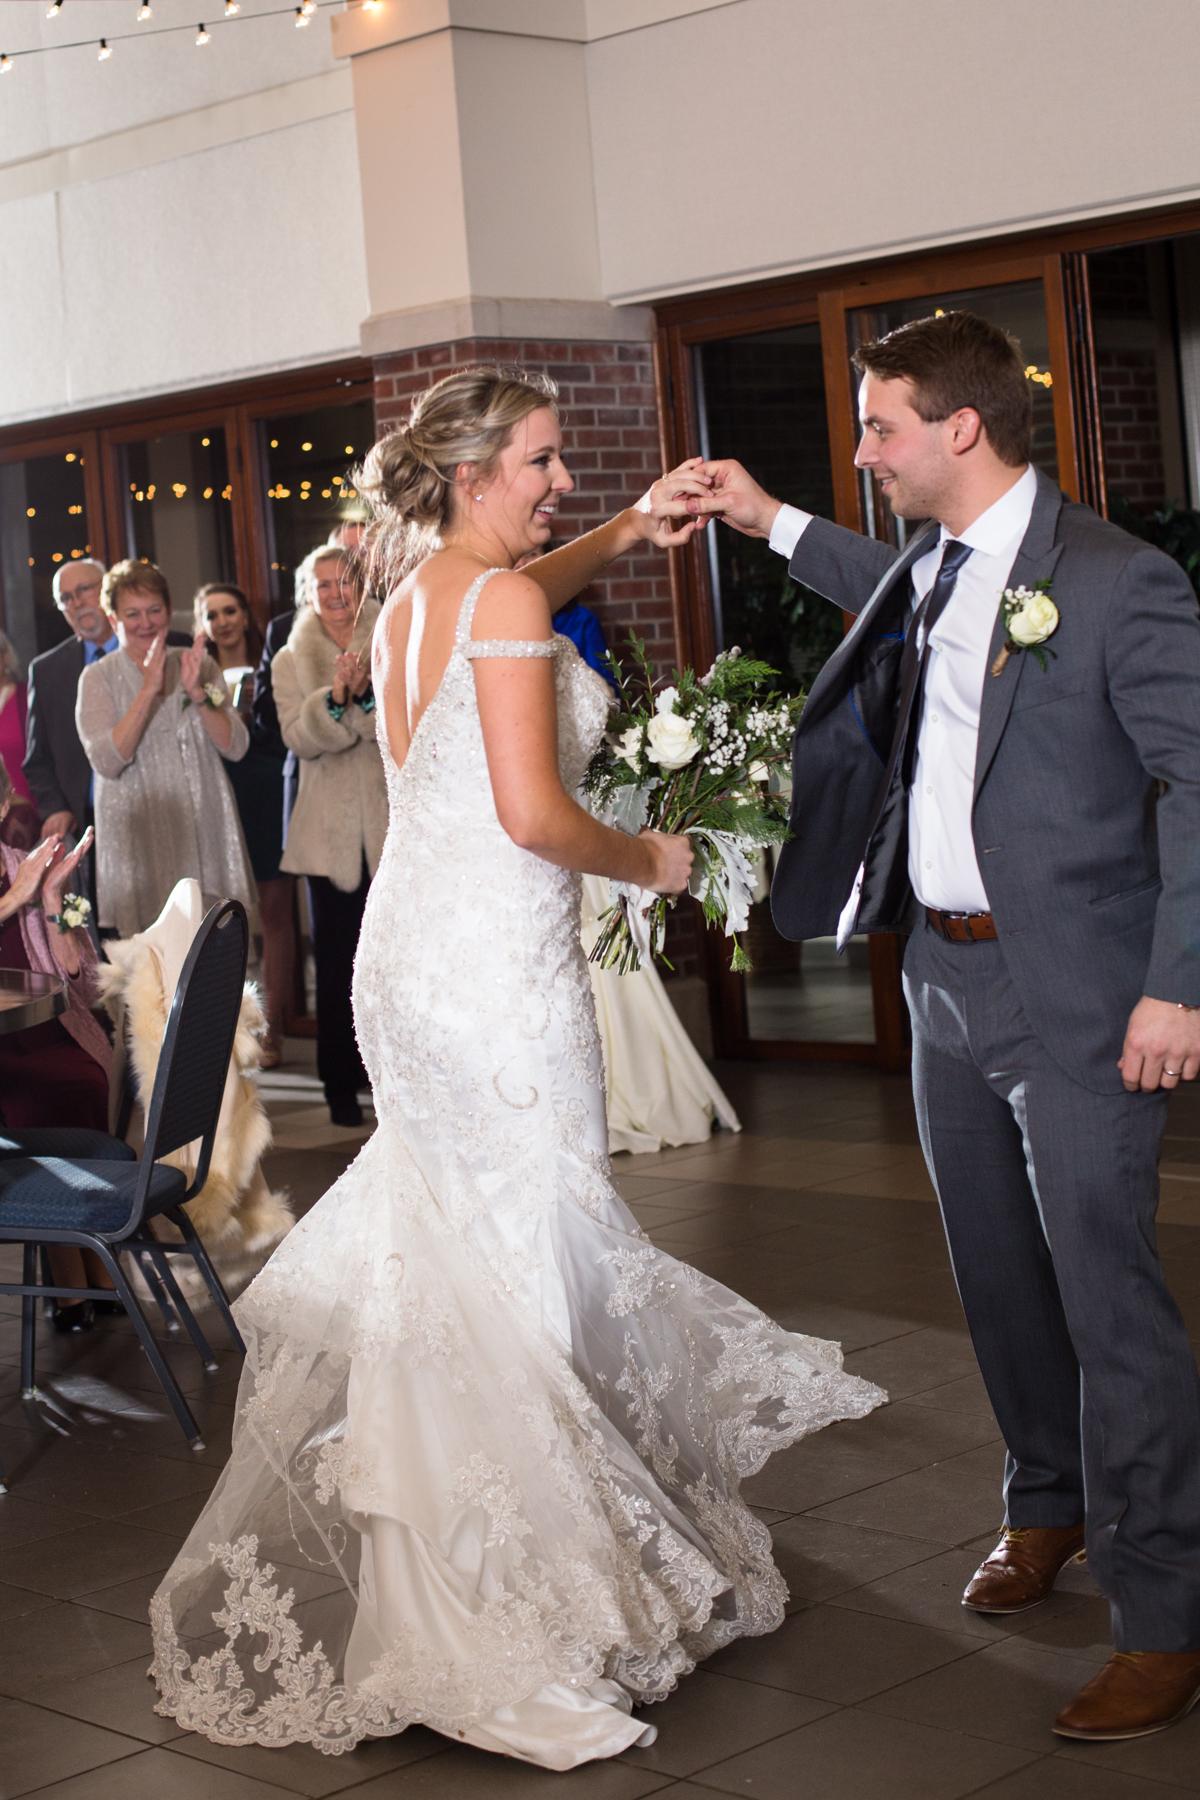 Kelli-and-Matt-Nashville-Wedding-Sneak-Peak-0267.jpg